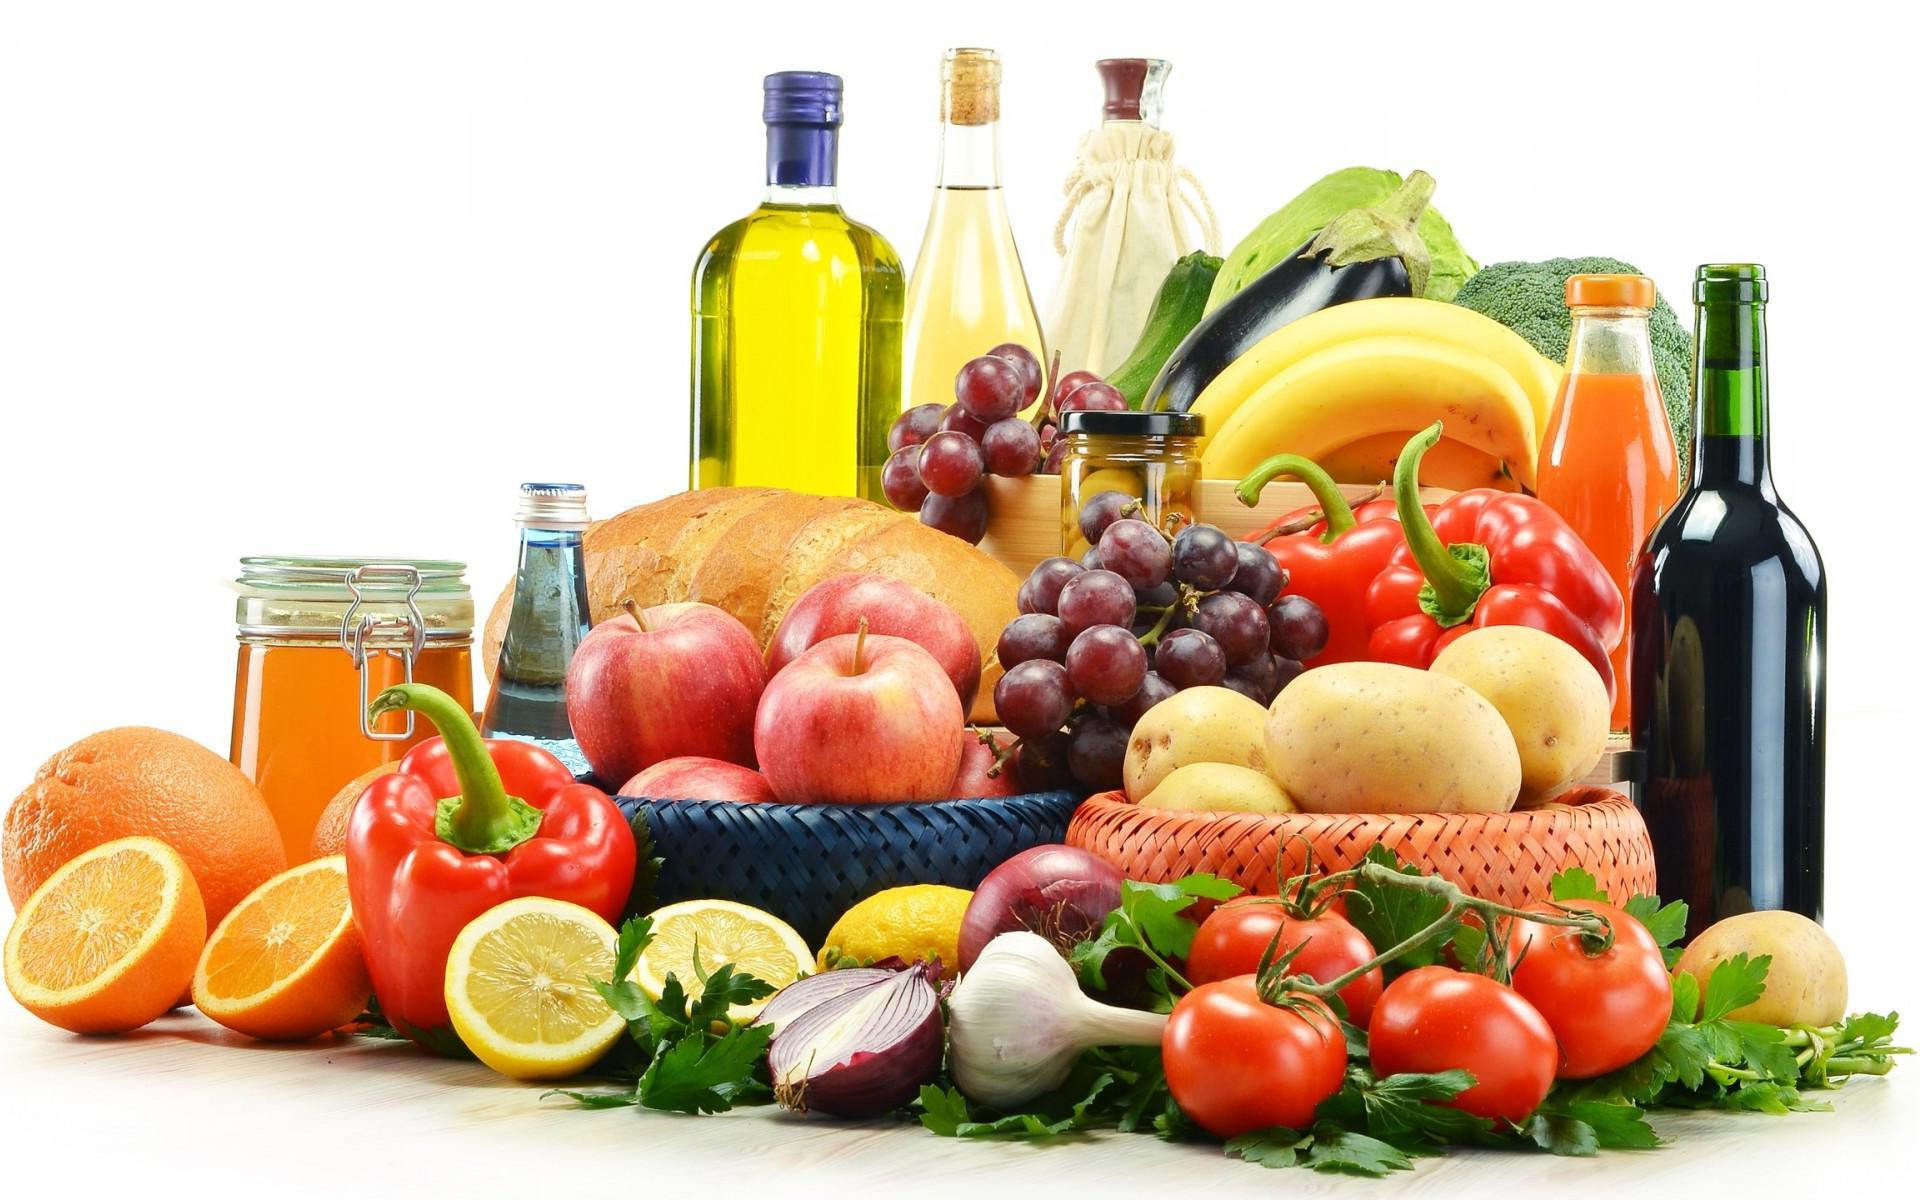 HD Desktop Healthy Food Wallpaper 7406 Wallpaper WallpapersTubecom 1920x1200